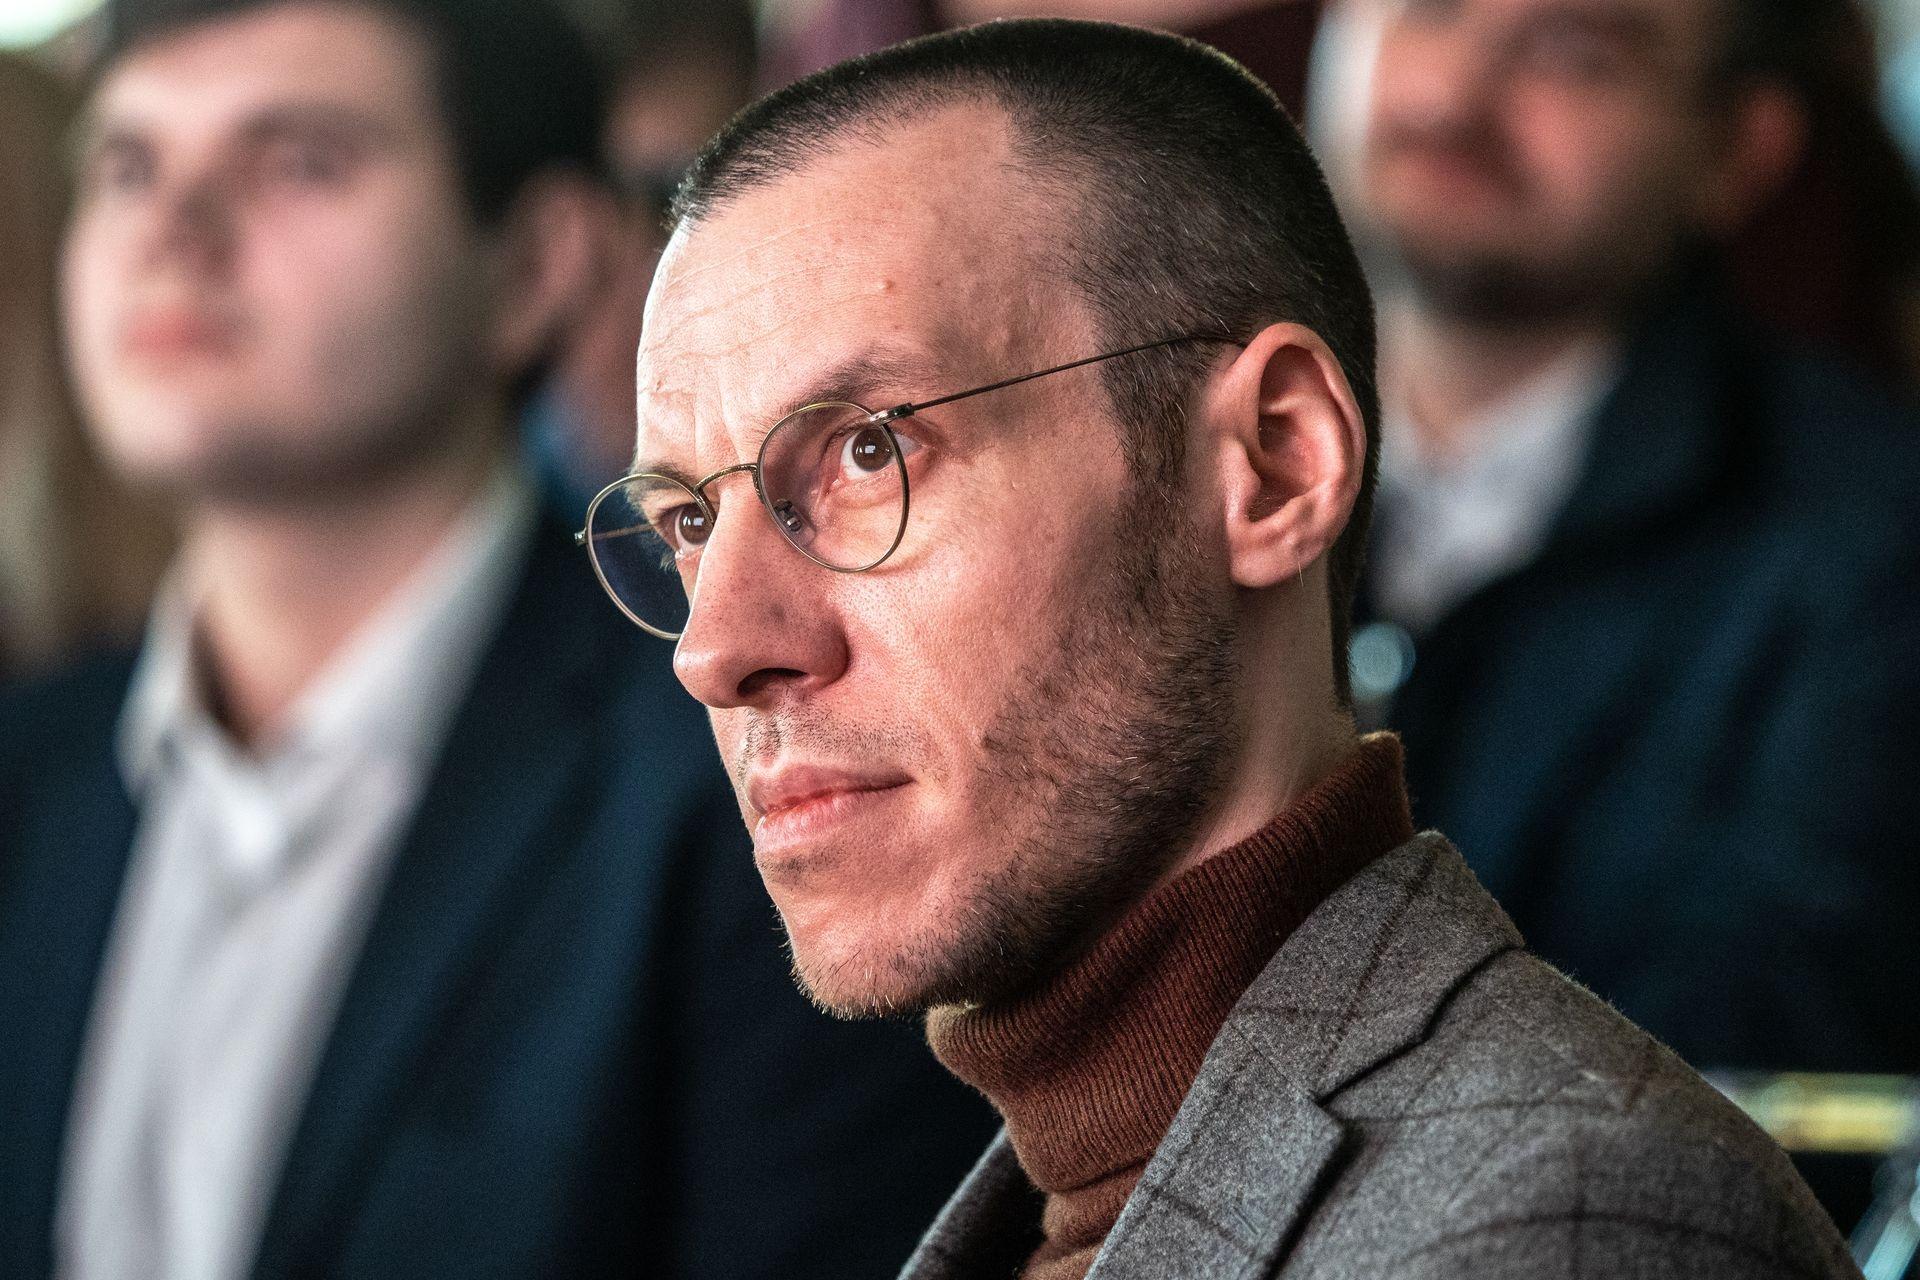 Специалист по кибербезопасности Андрей Сембаев